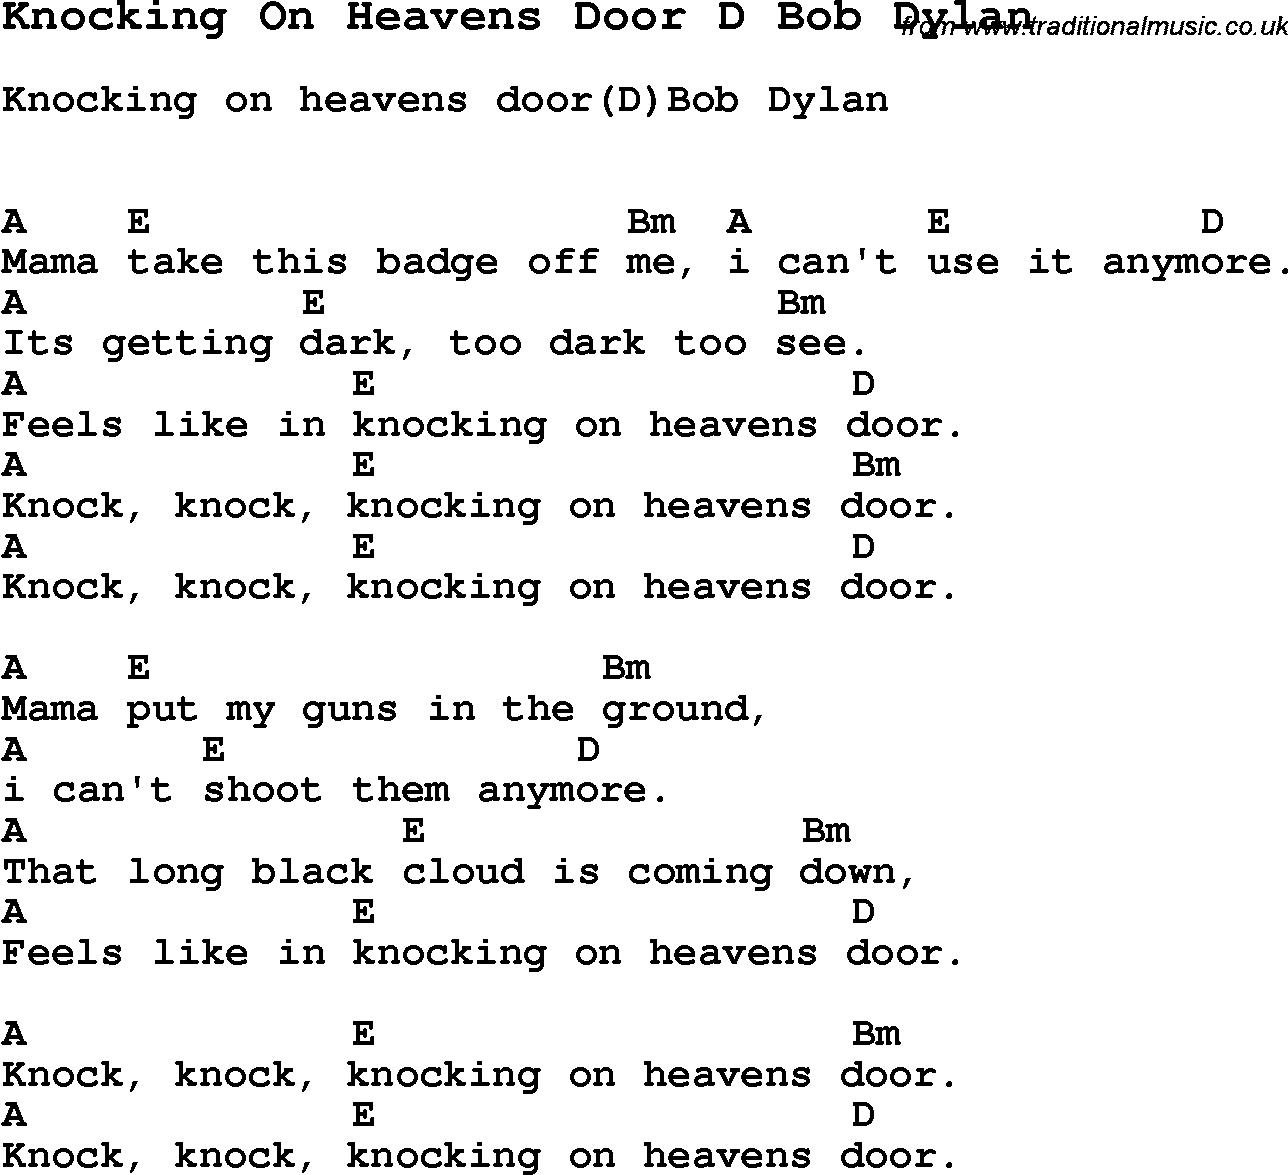 Knocking On Heavens Door Chords Song Knocking On Heavens Door D Bob Dylan Song Lyric For Vocal